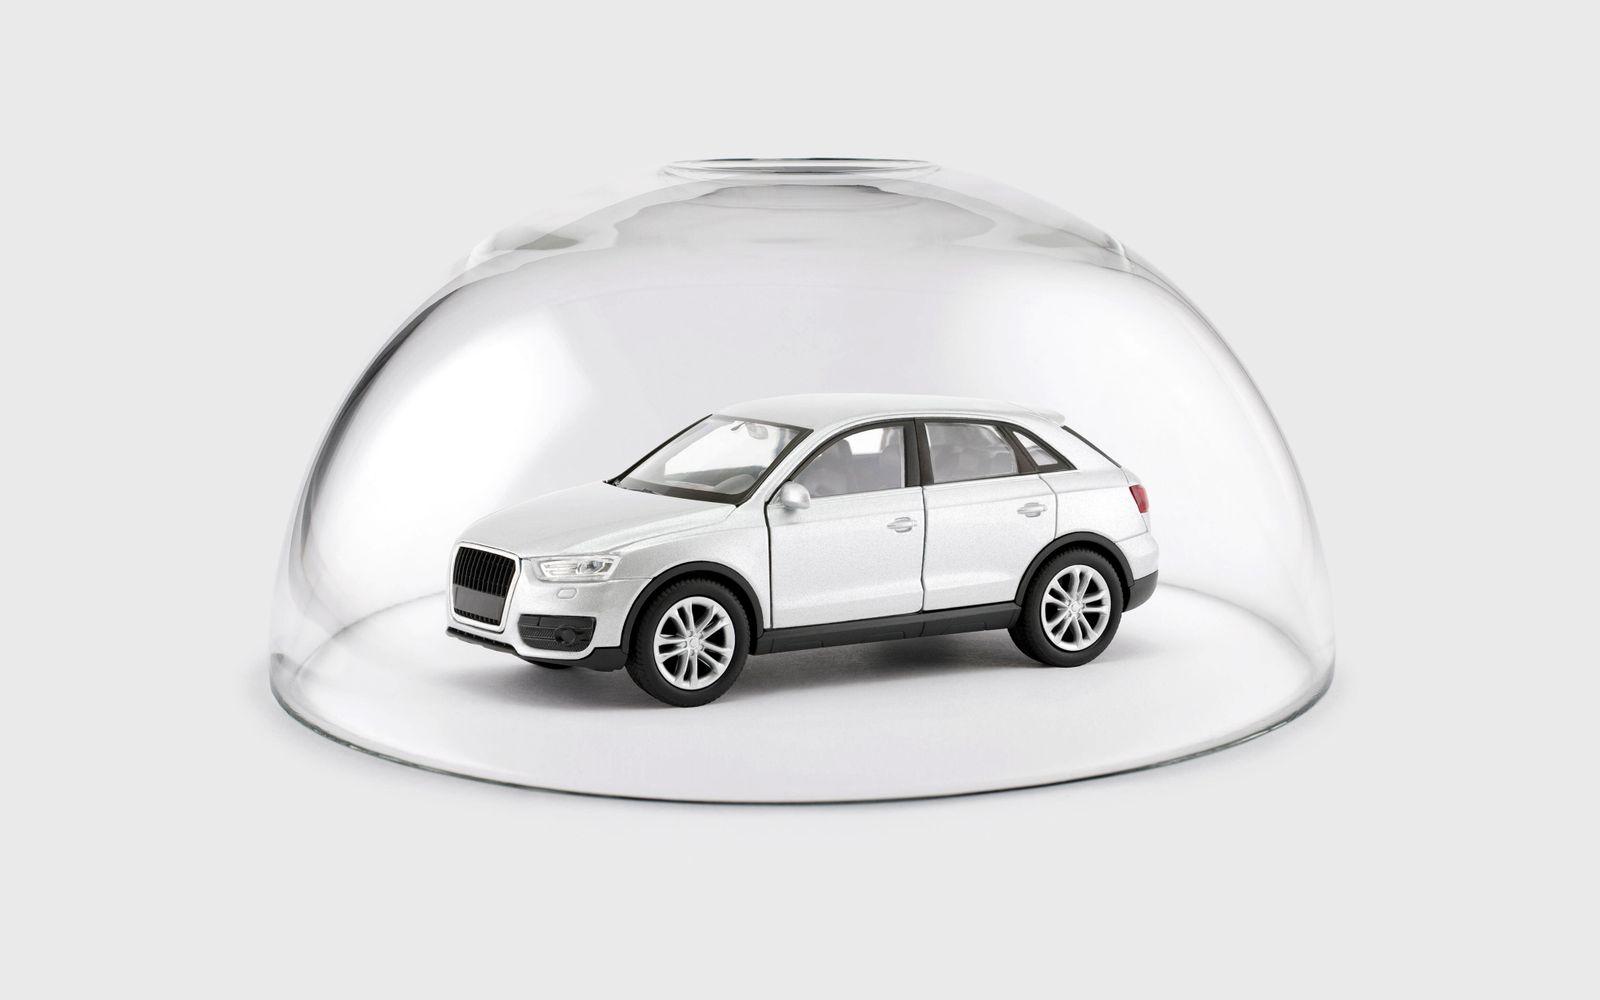 Modern silver car protected under a glass dome PUBLICATIONxINxGERxSUIxAUTxONLY Copyright xsqbackx